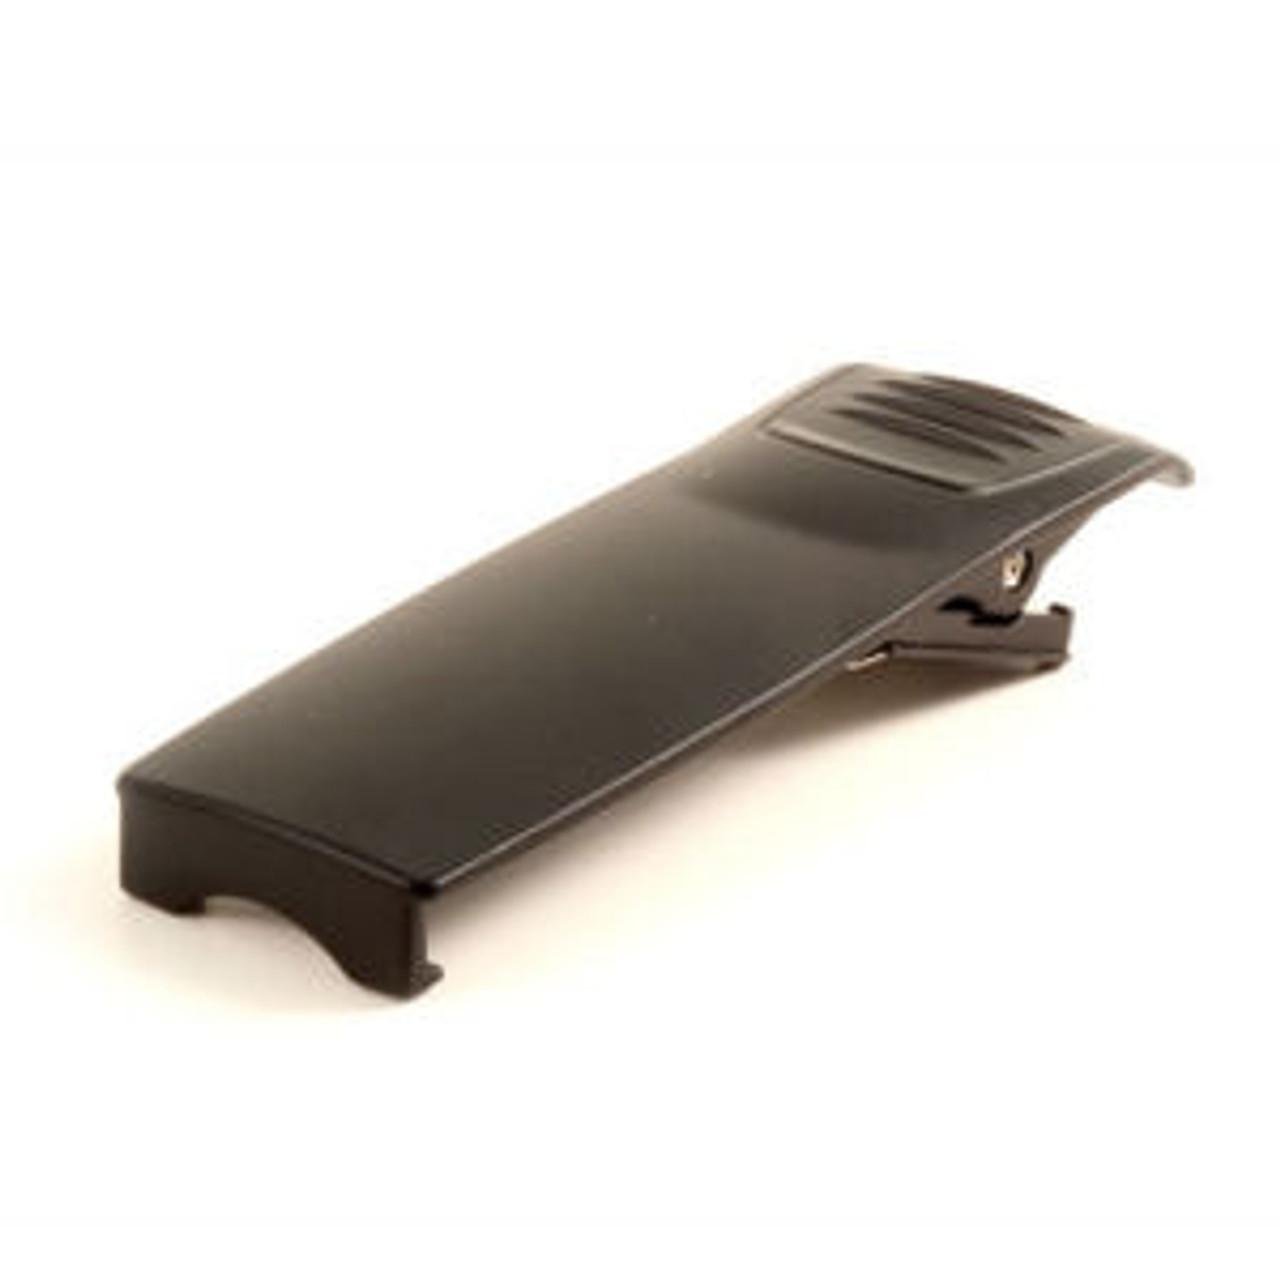 GE / Ericsson LPE-50 Metal, Spring Loaded Belt Clip